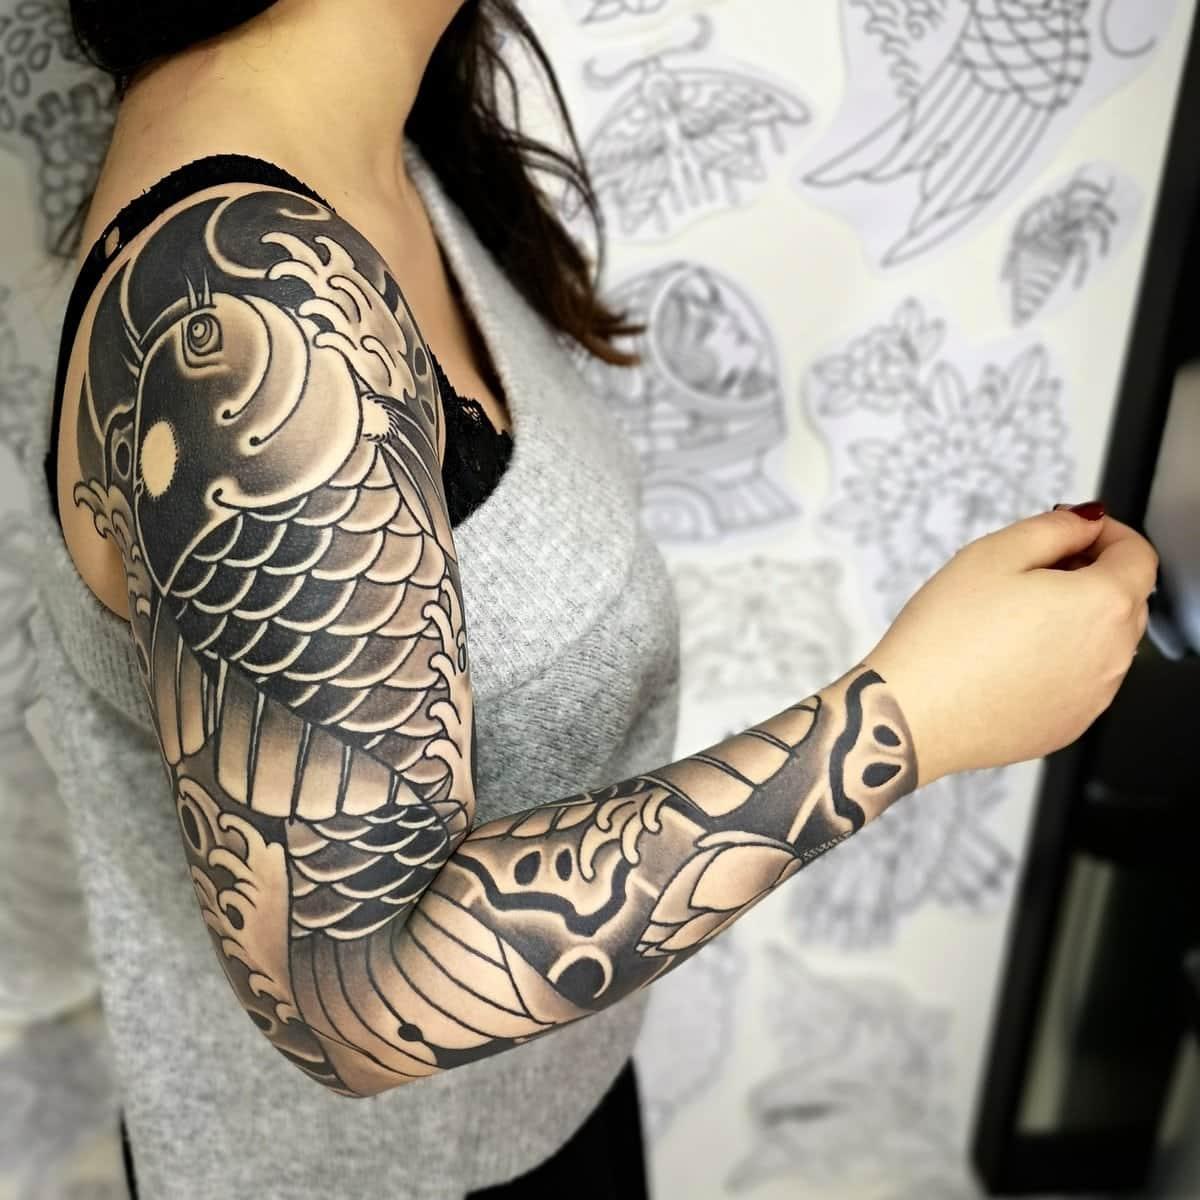 ghis-melou-tattoo-blackwork-sleeve-woman